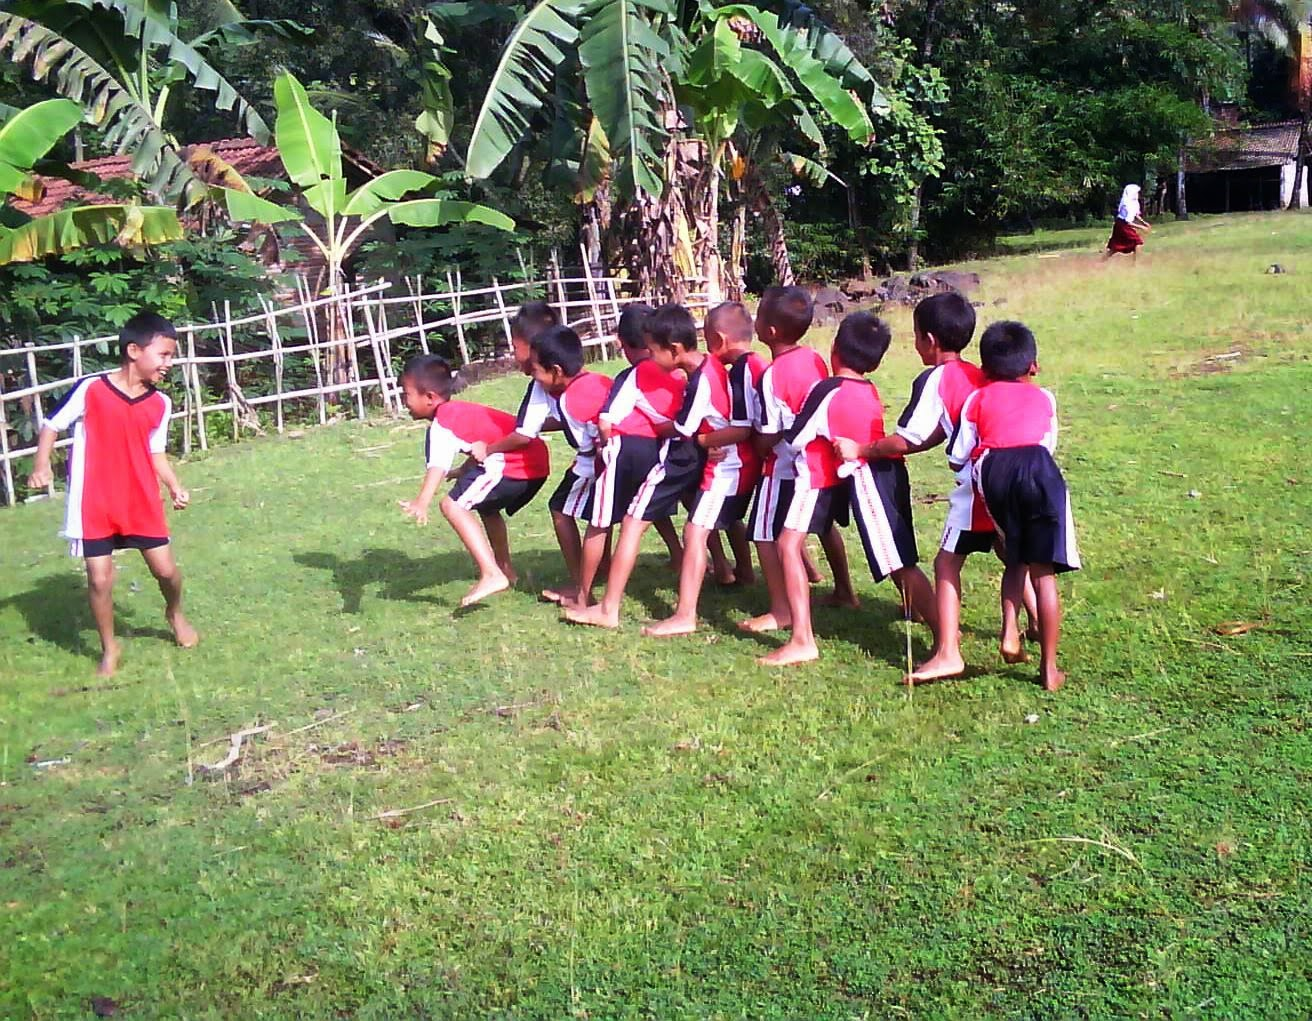 Jenis Jenis Permainan Olahraga untuk Anak SD - Guru Penjaskes